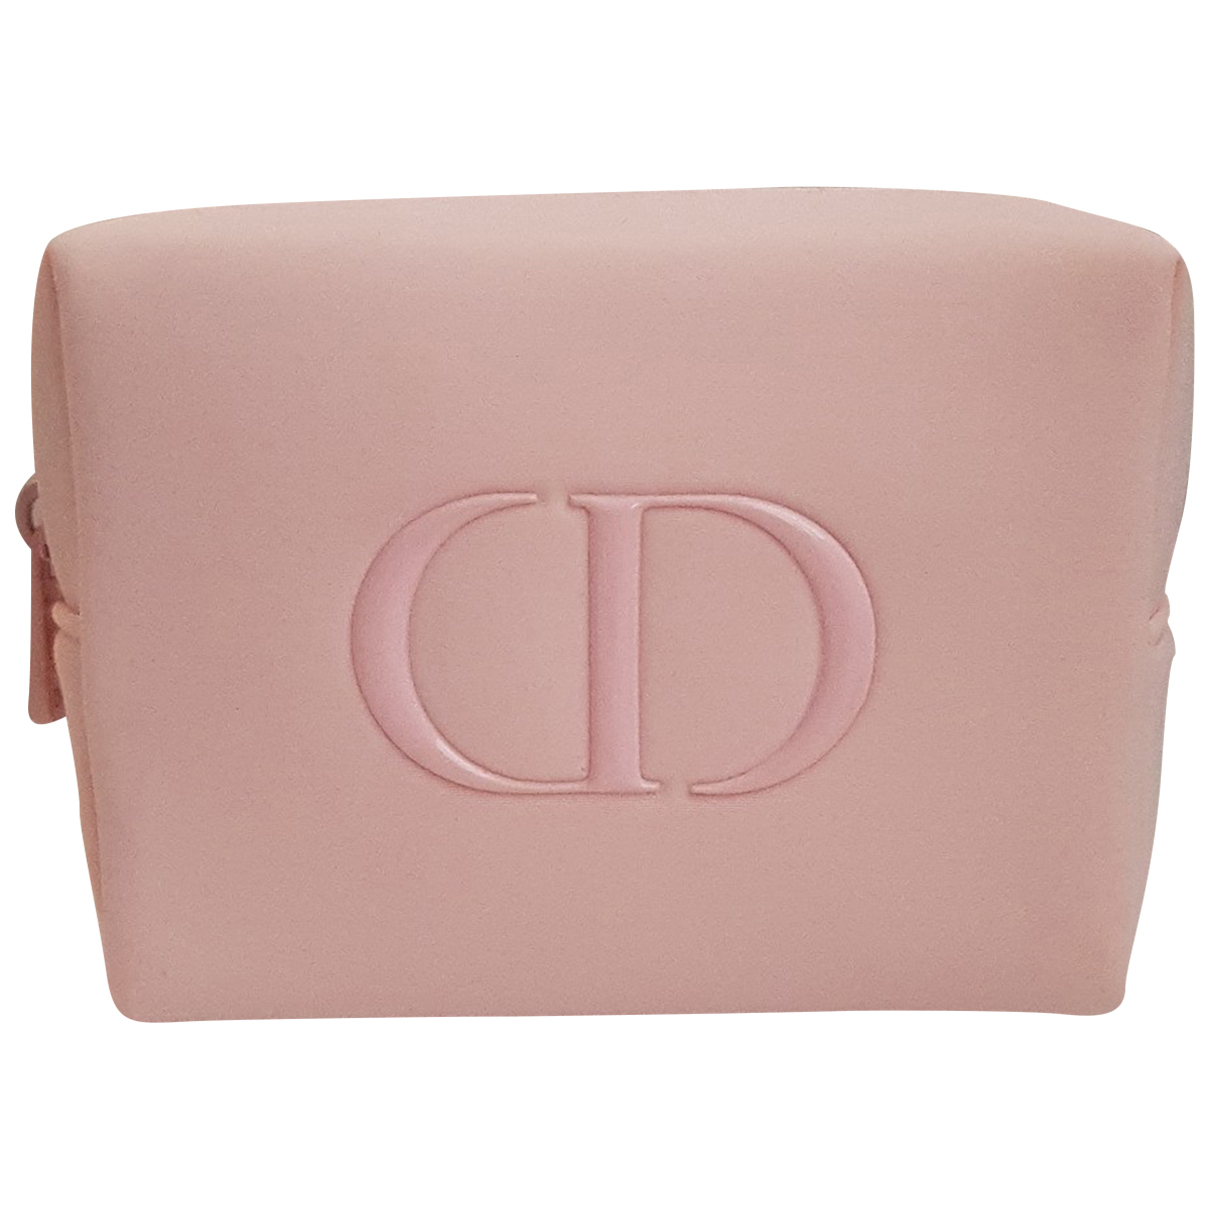 Neceser de Lona Dior